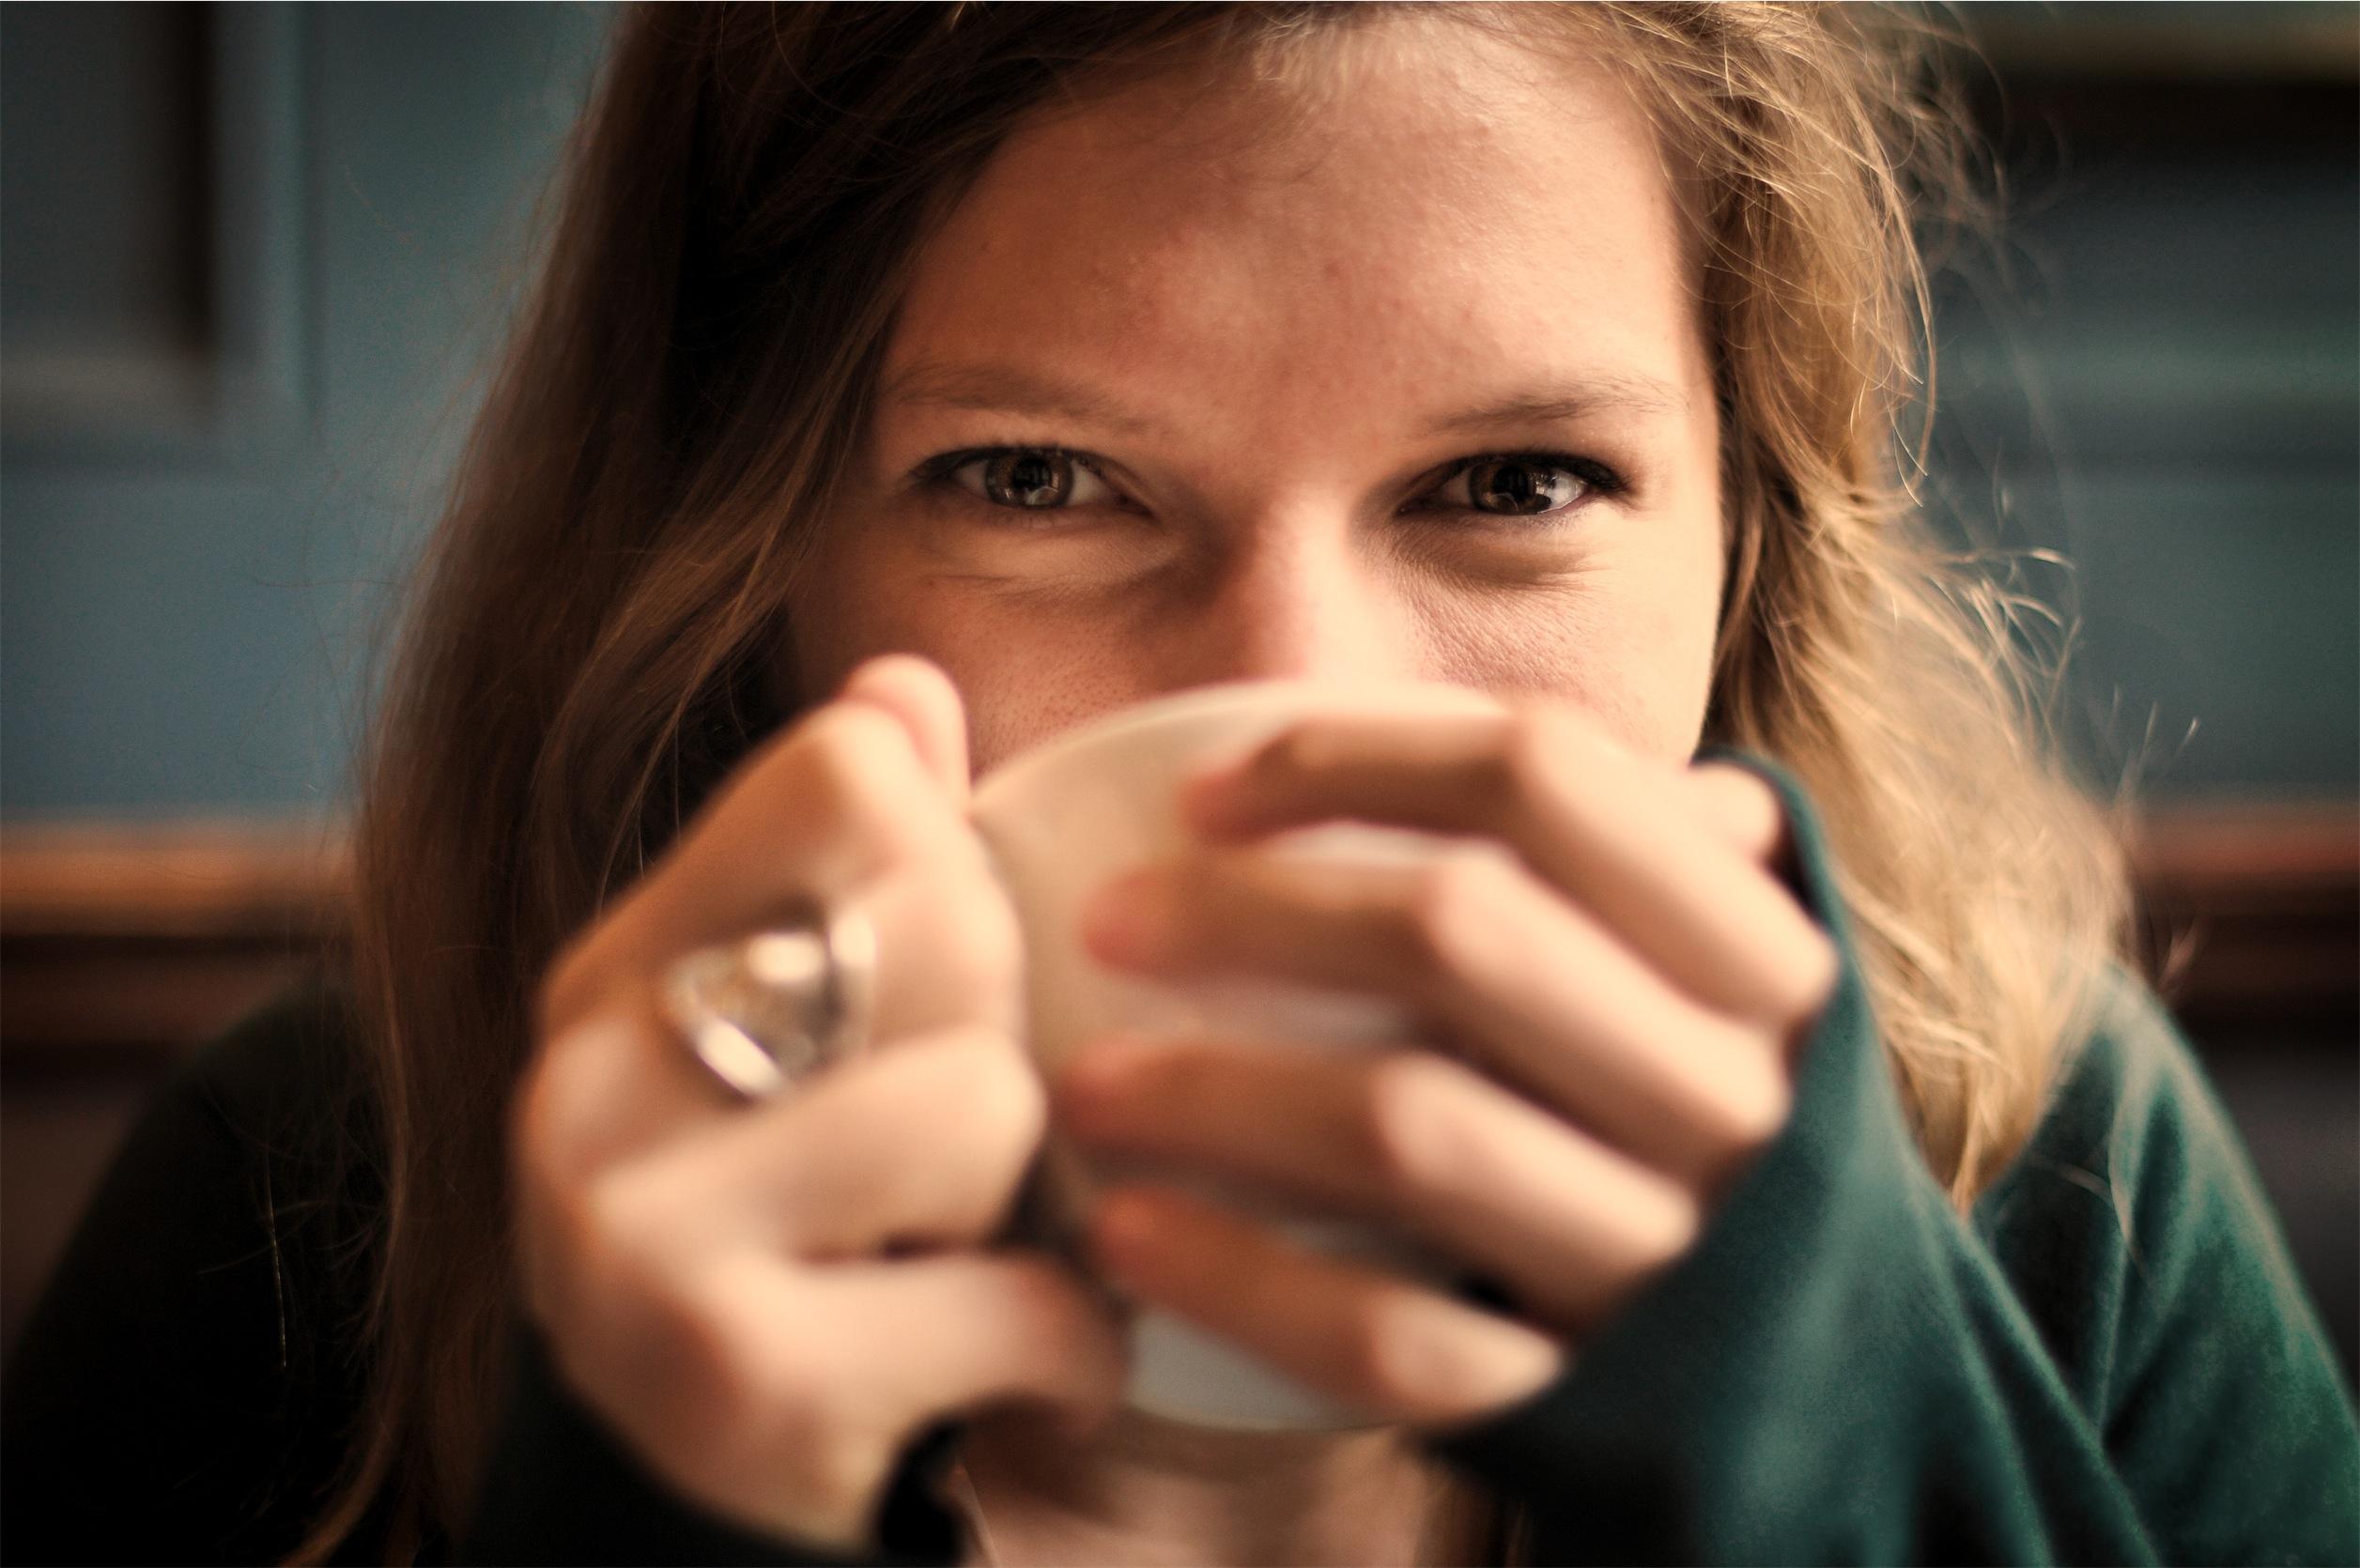 Chugging Lattes Won't Fix Your Energy Problem